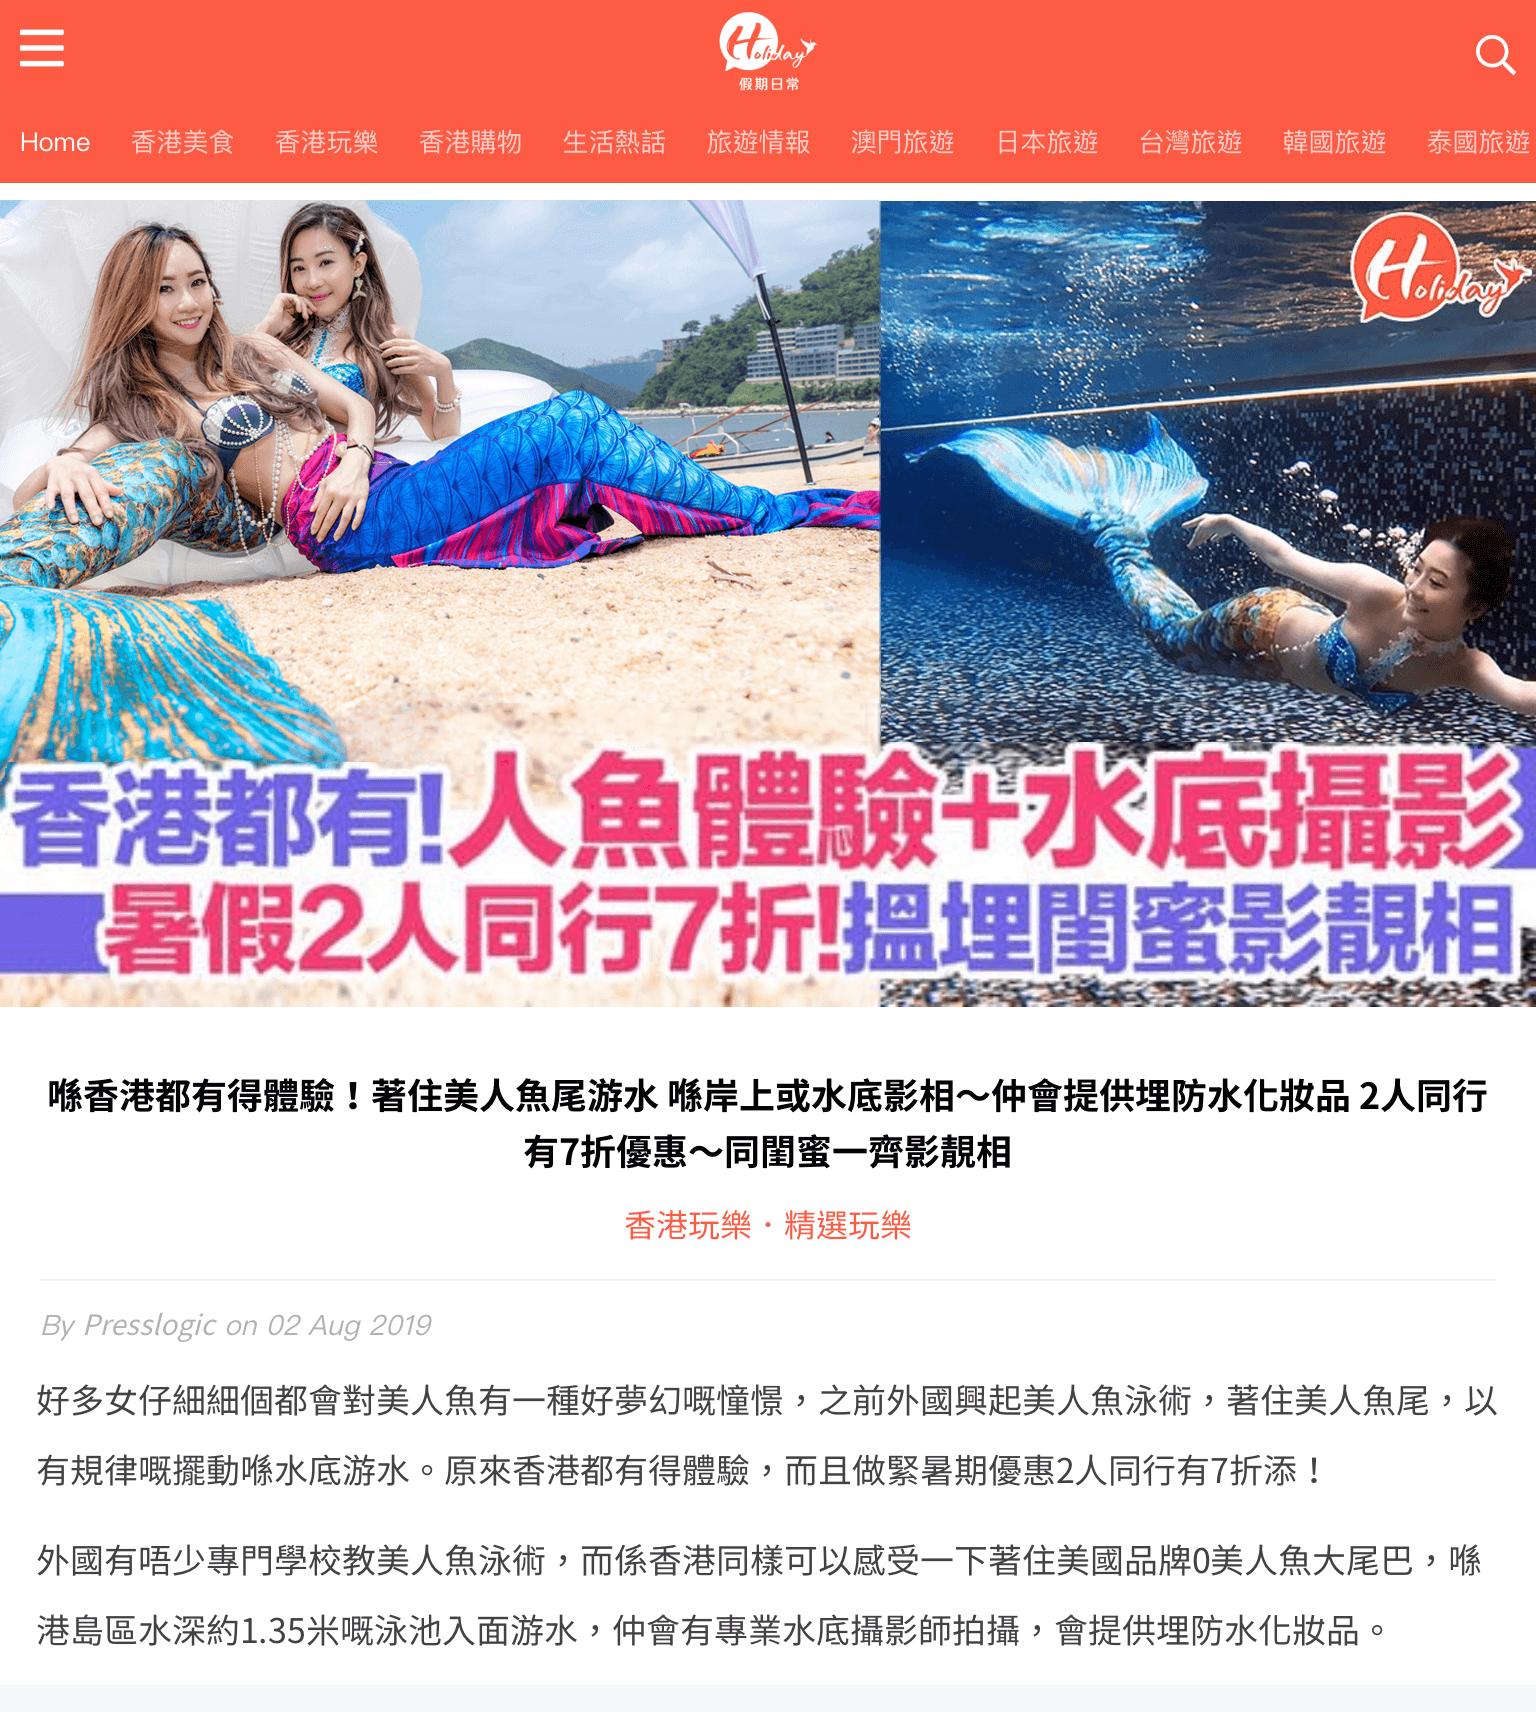 [Presslogic] 喺香港都有得體驗-著住美人魚尾游水-喺岸上或水底影相